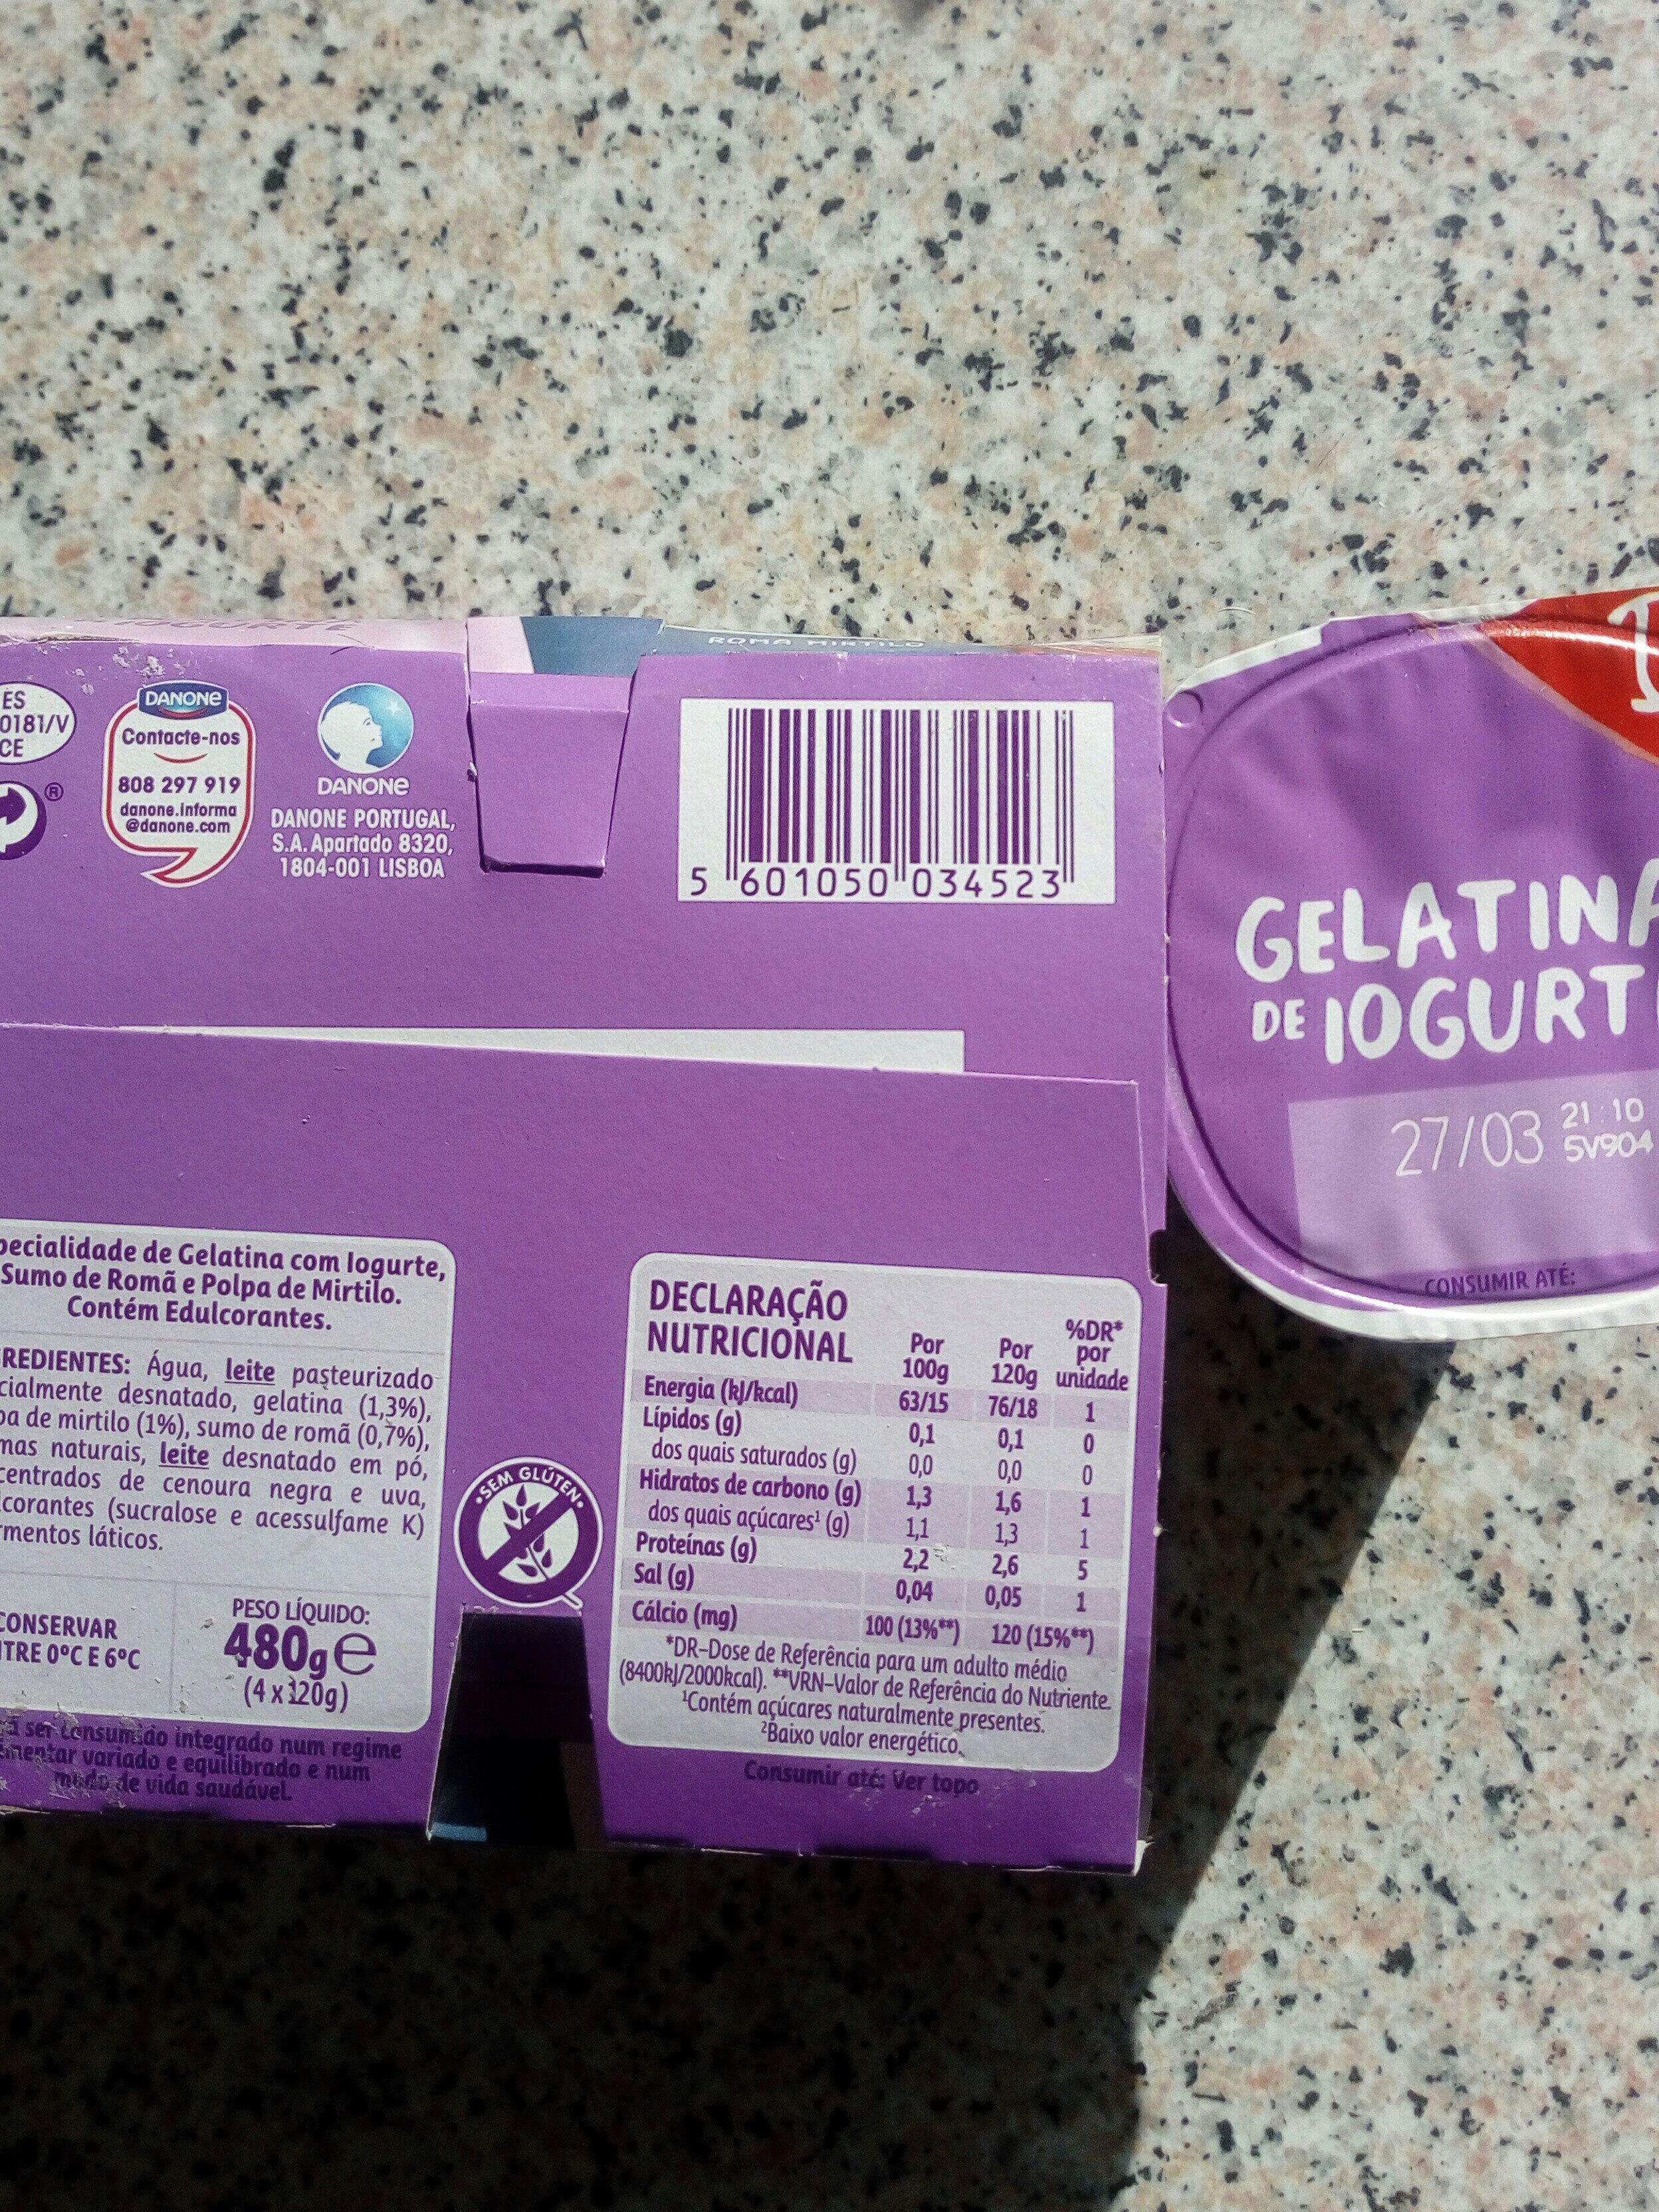 gelatina de iogurte - Product - pt